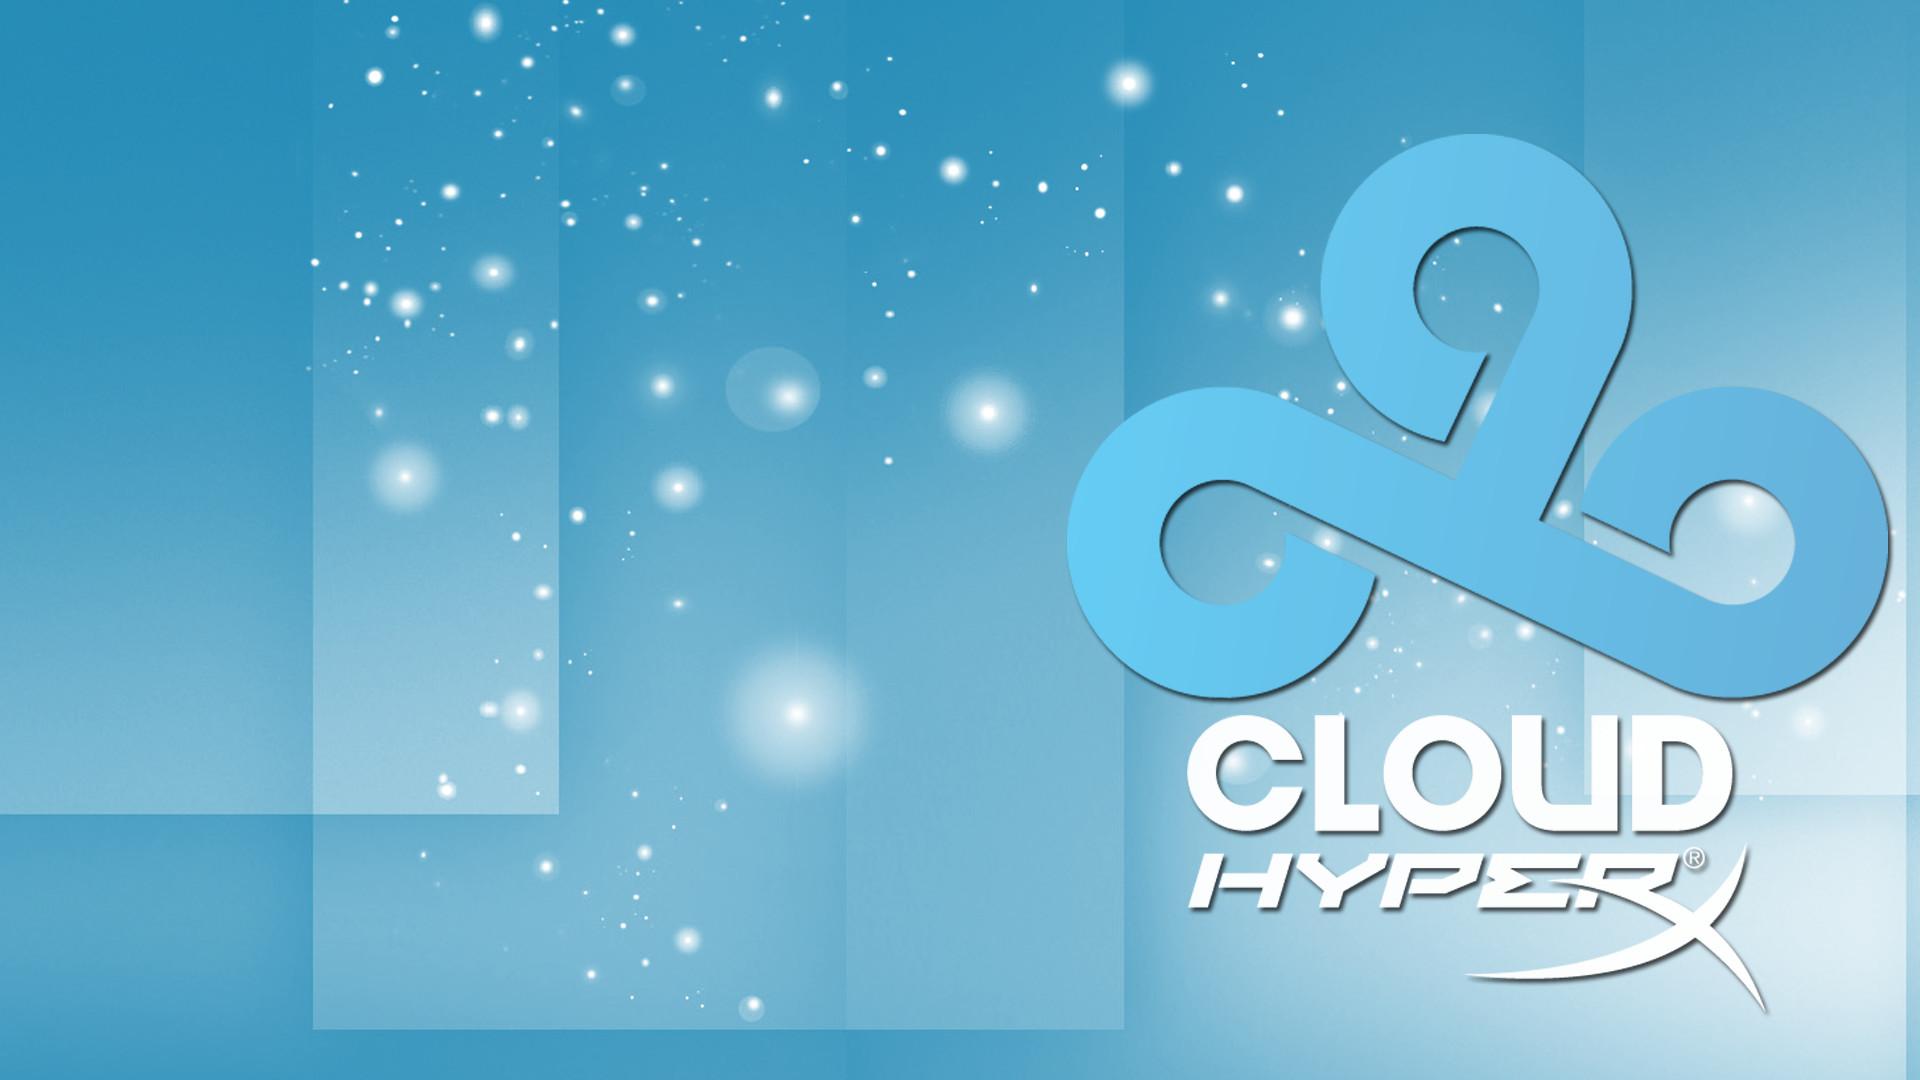 cloud 9 wallpaper picture, cloud 9 wallpaper image, cloud 9 wallpaper .